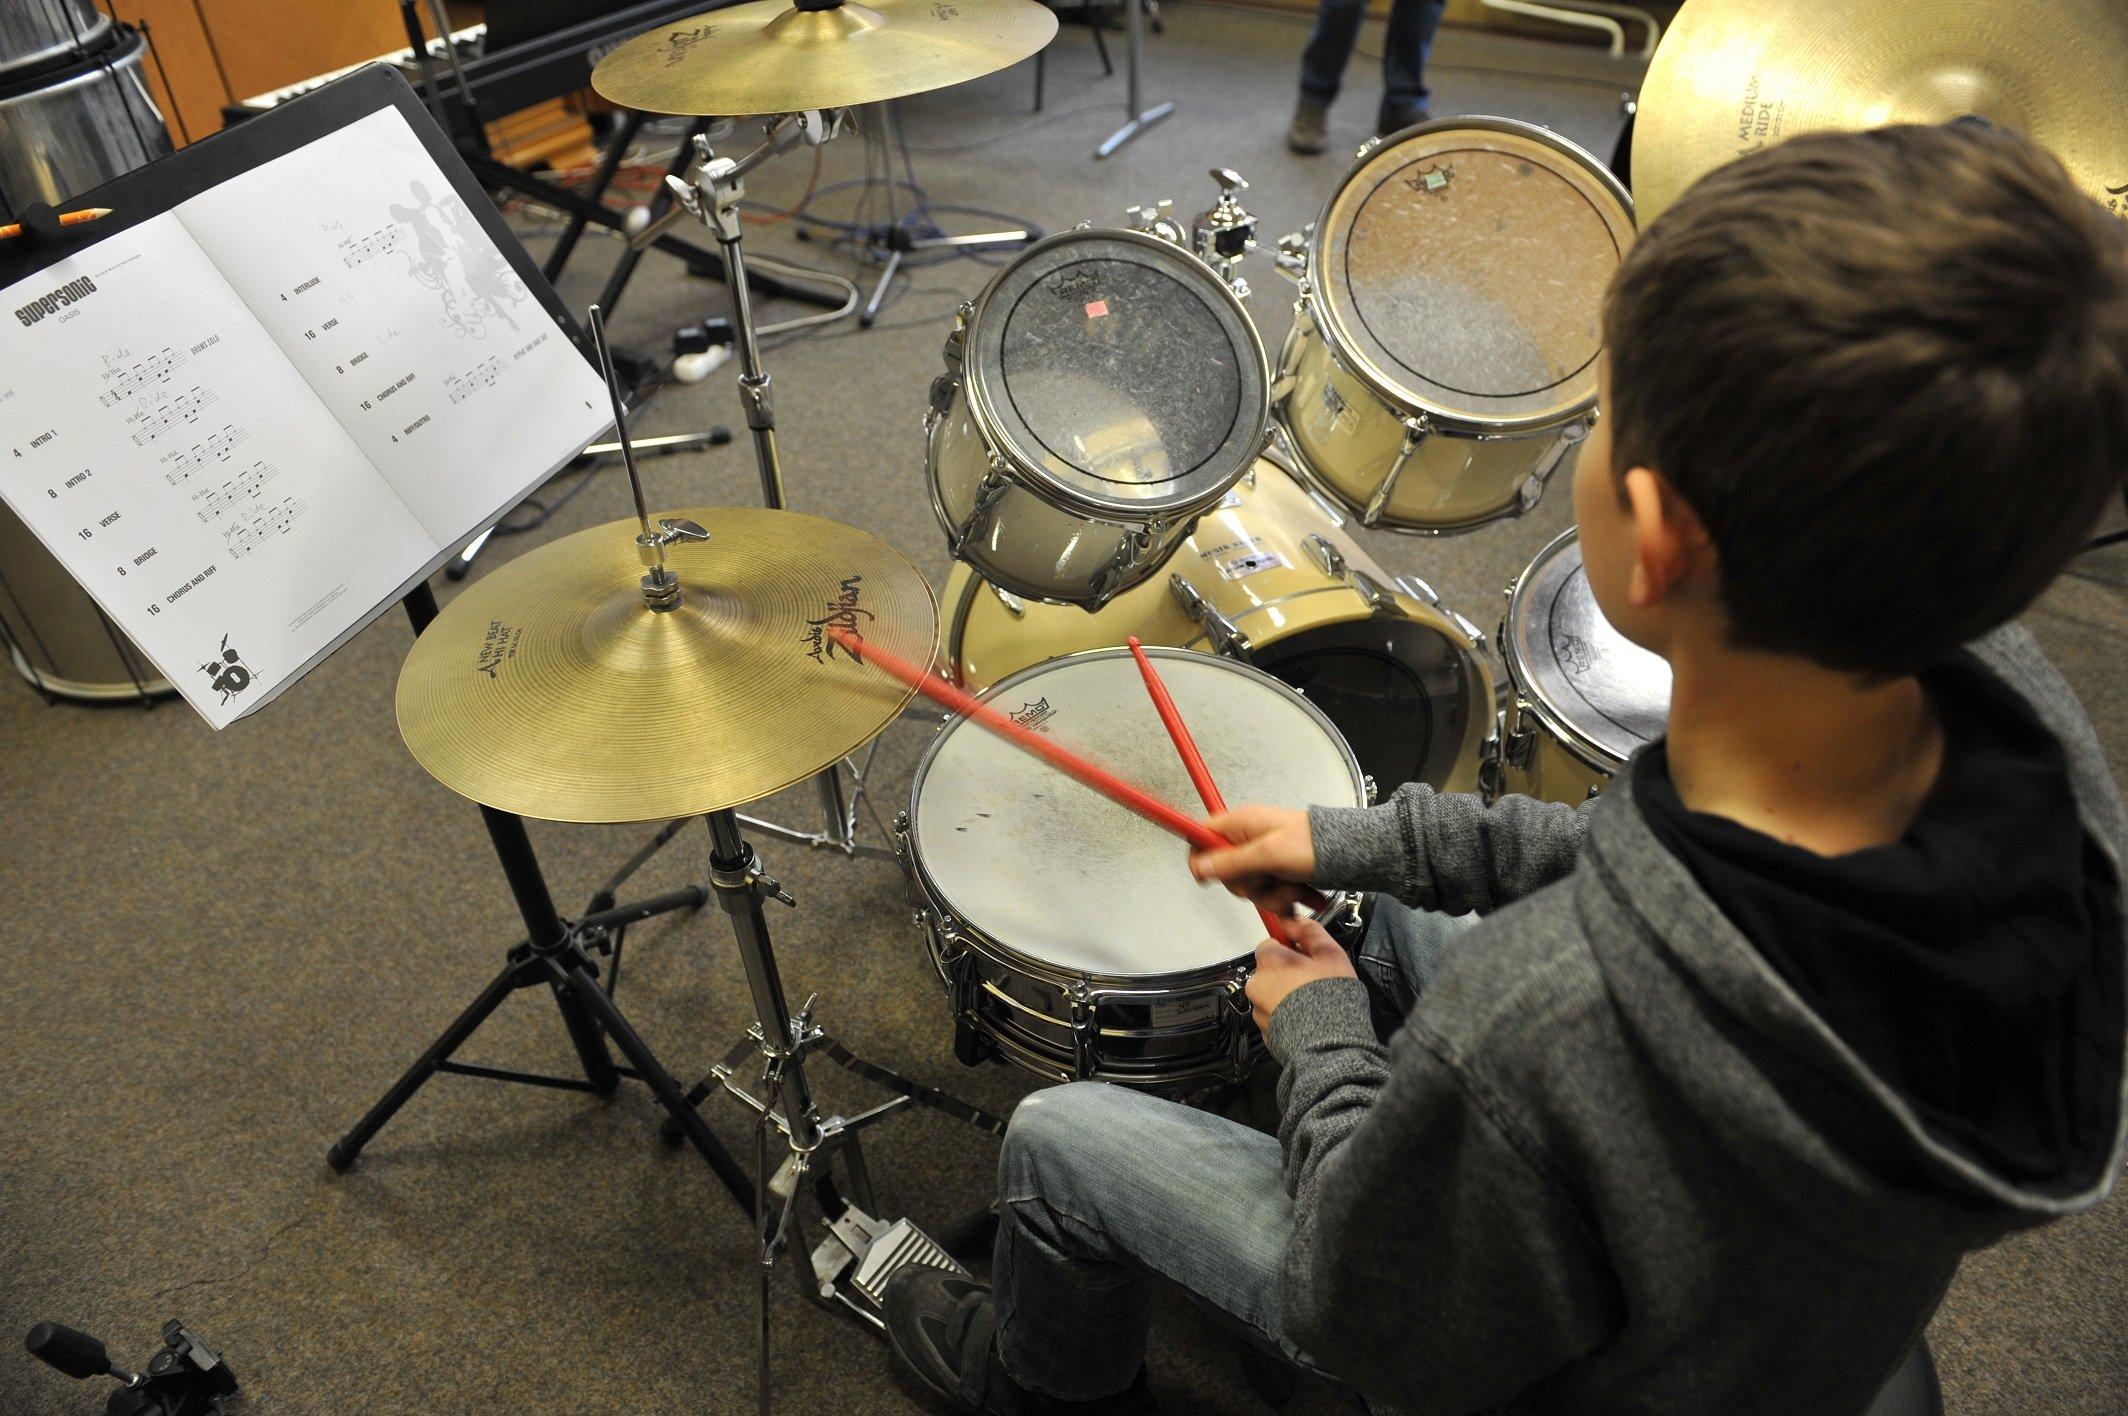 Preisträgerkonzert mit Preisverleihung des 57. Regionalwettbewerbs Jugend musiziert - © Peter Roggenthin